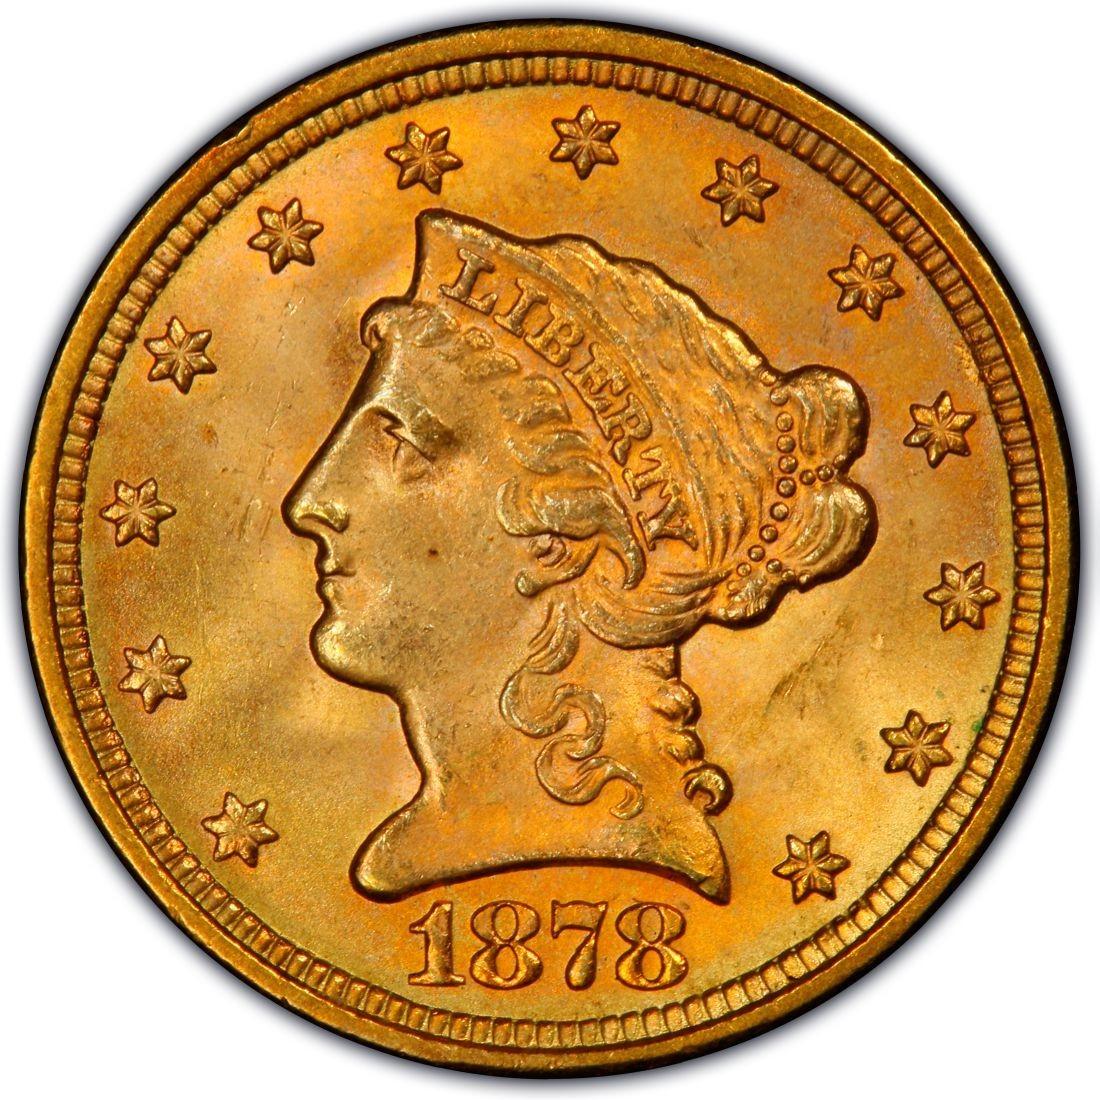 1878 Liberty Head 2 50 Gold Quarter Eagle Coin